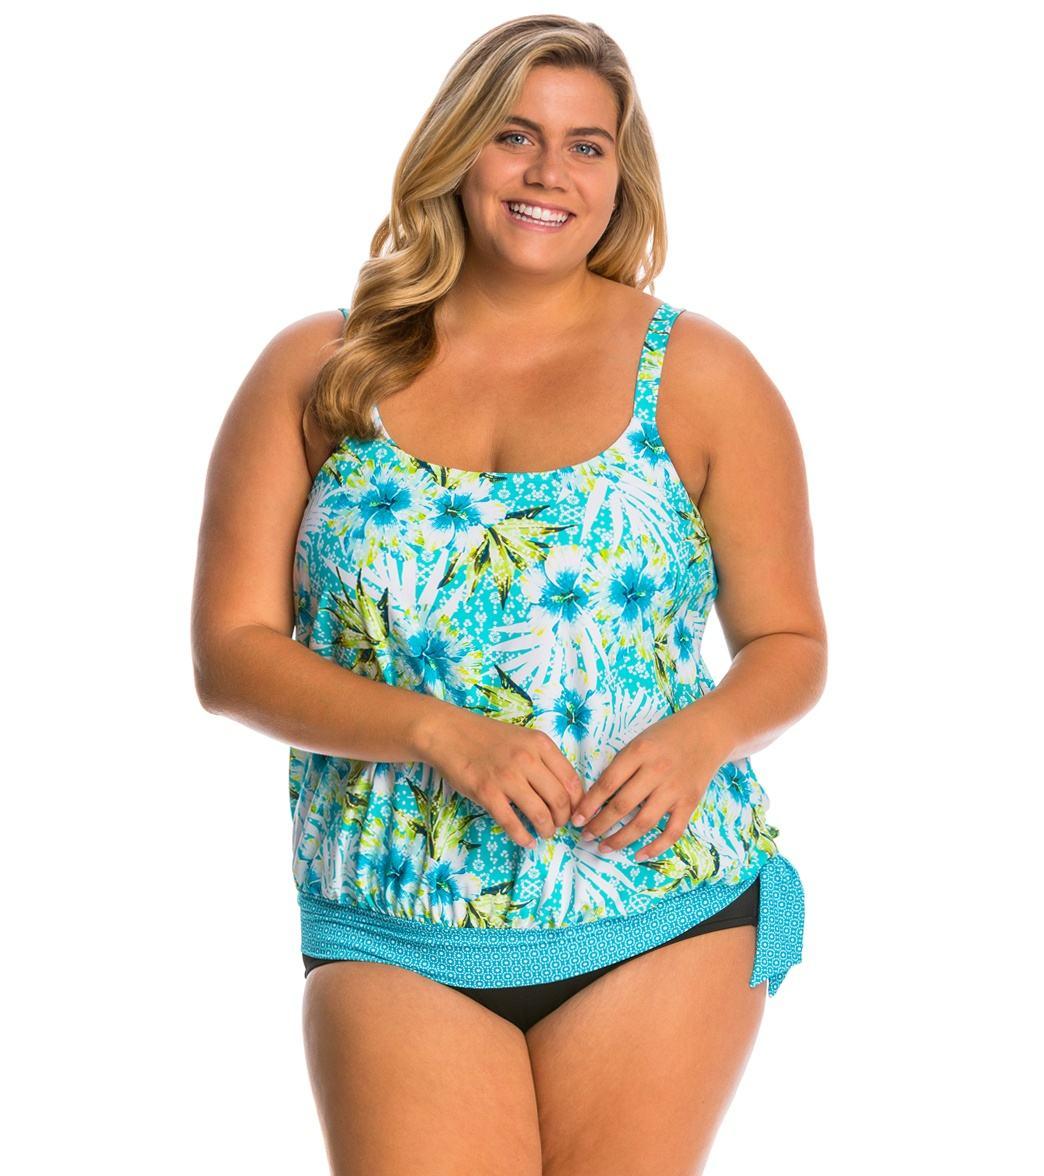 623e851b9a1 ... Beach House Plus Size Tybee Island Sarah Bouson Tankini Top Play Video.  Play Video